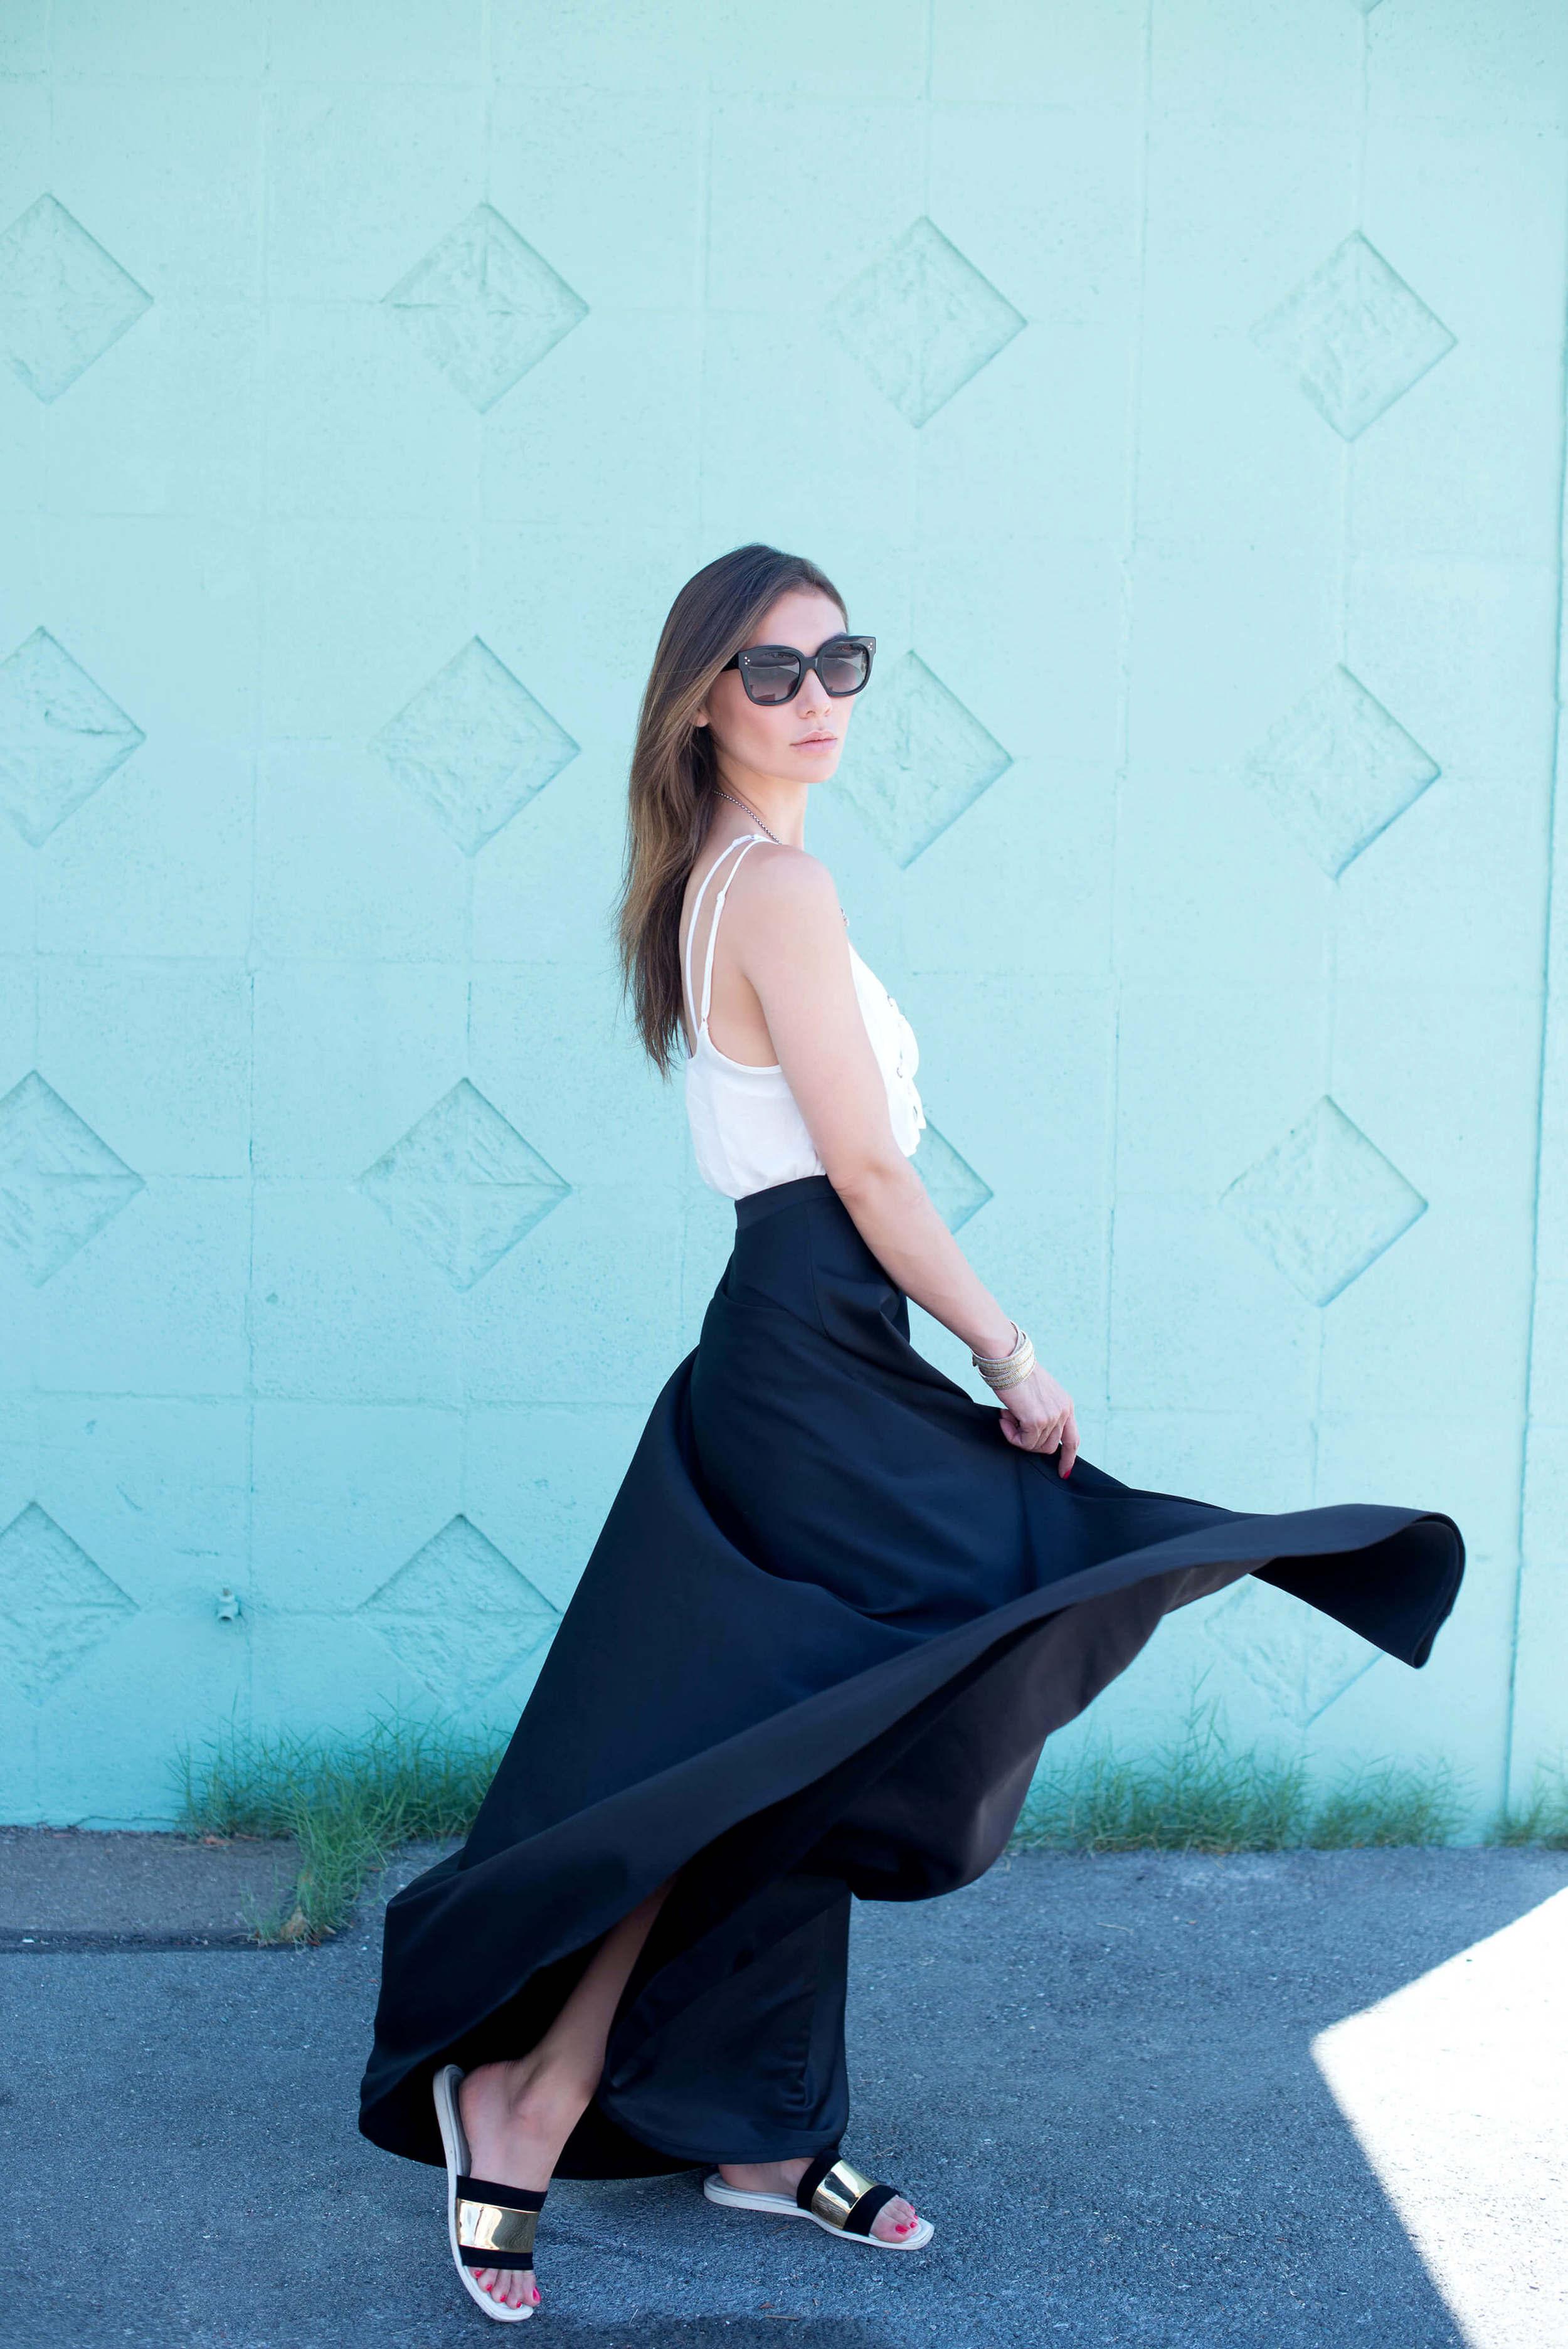 Windsor maxi skirt summer outfit